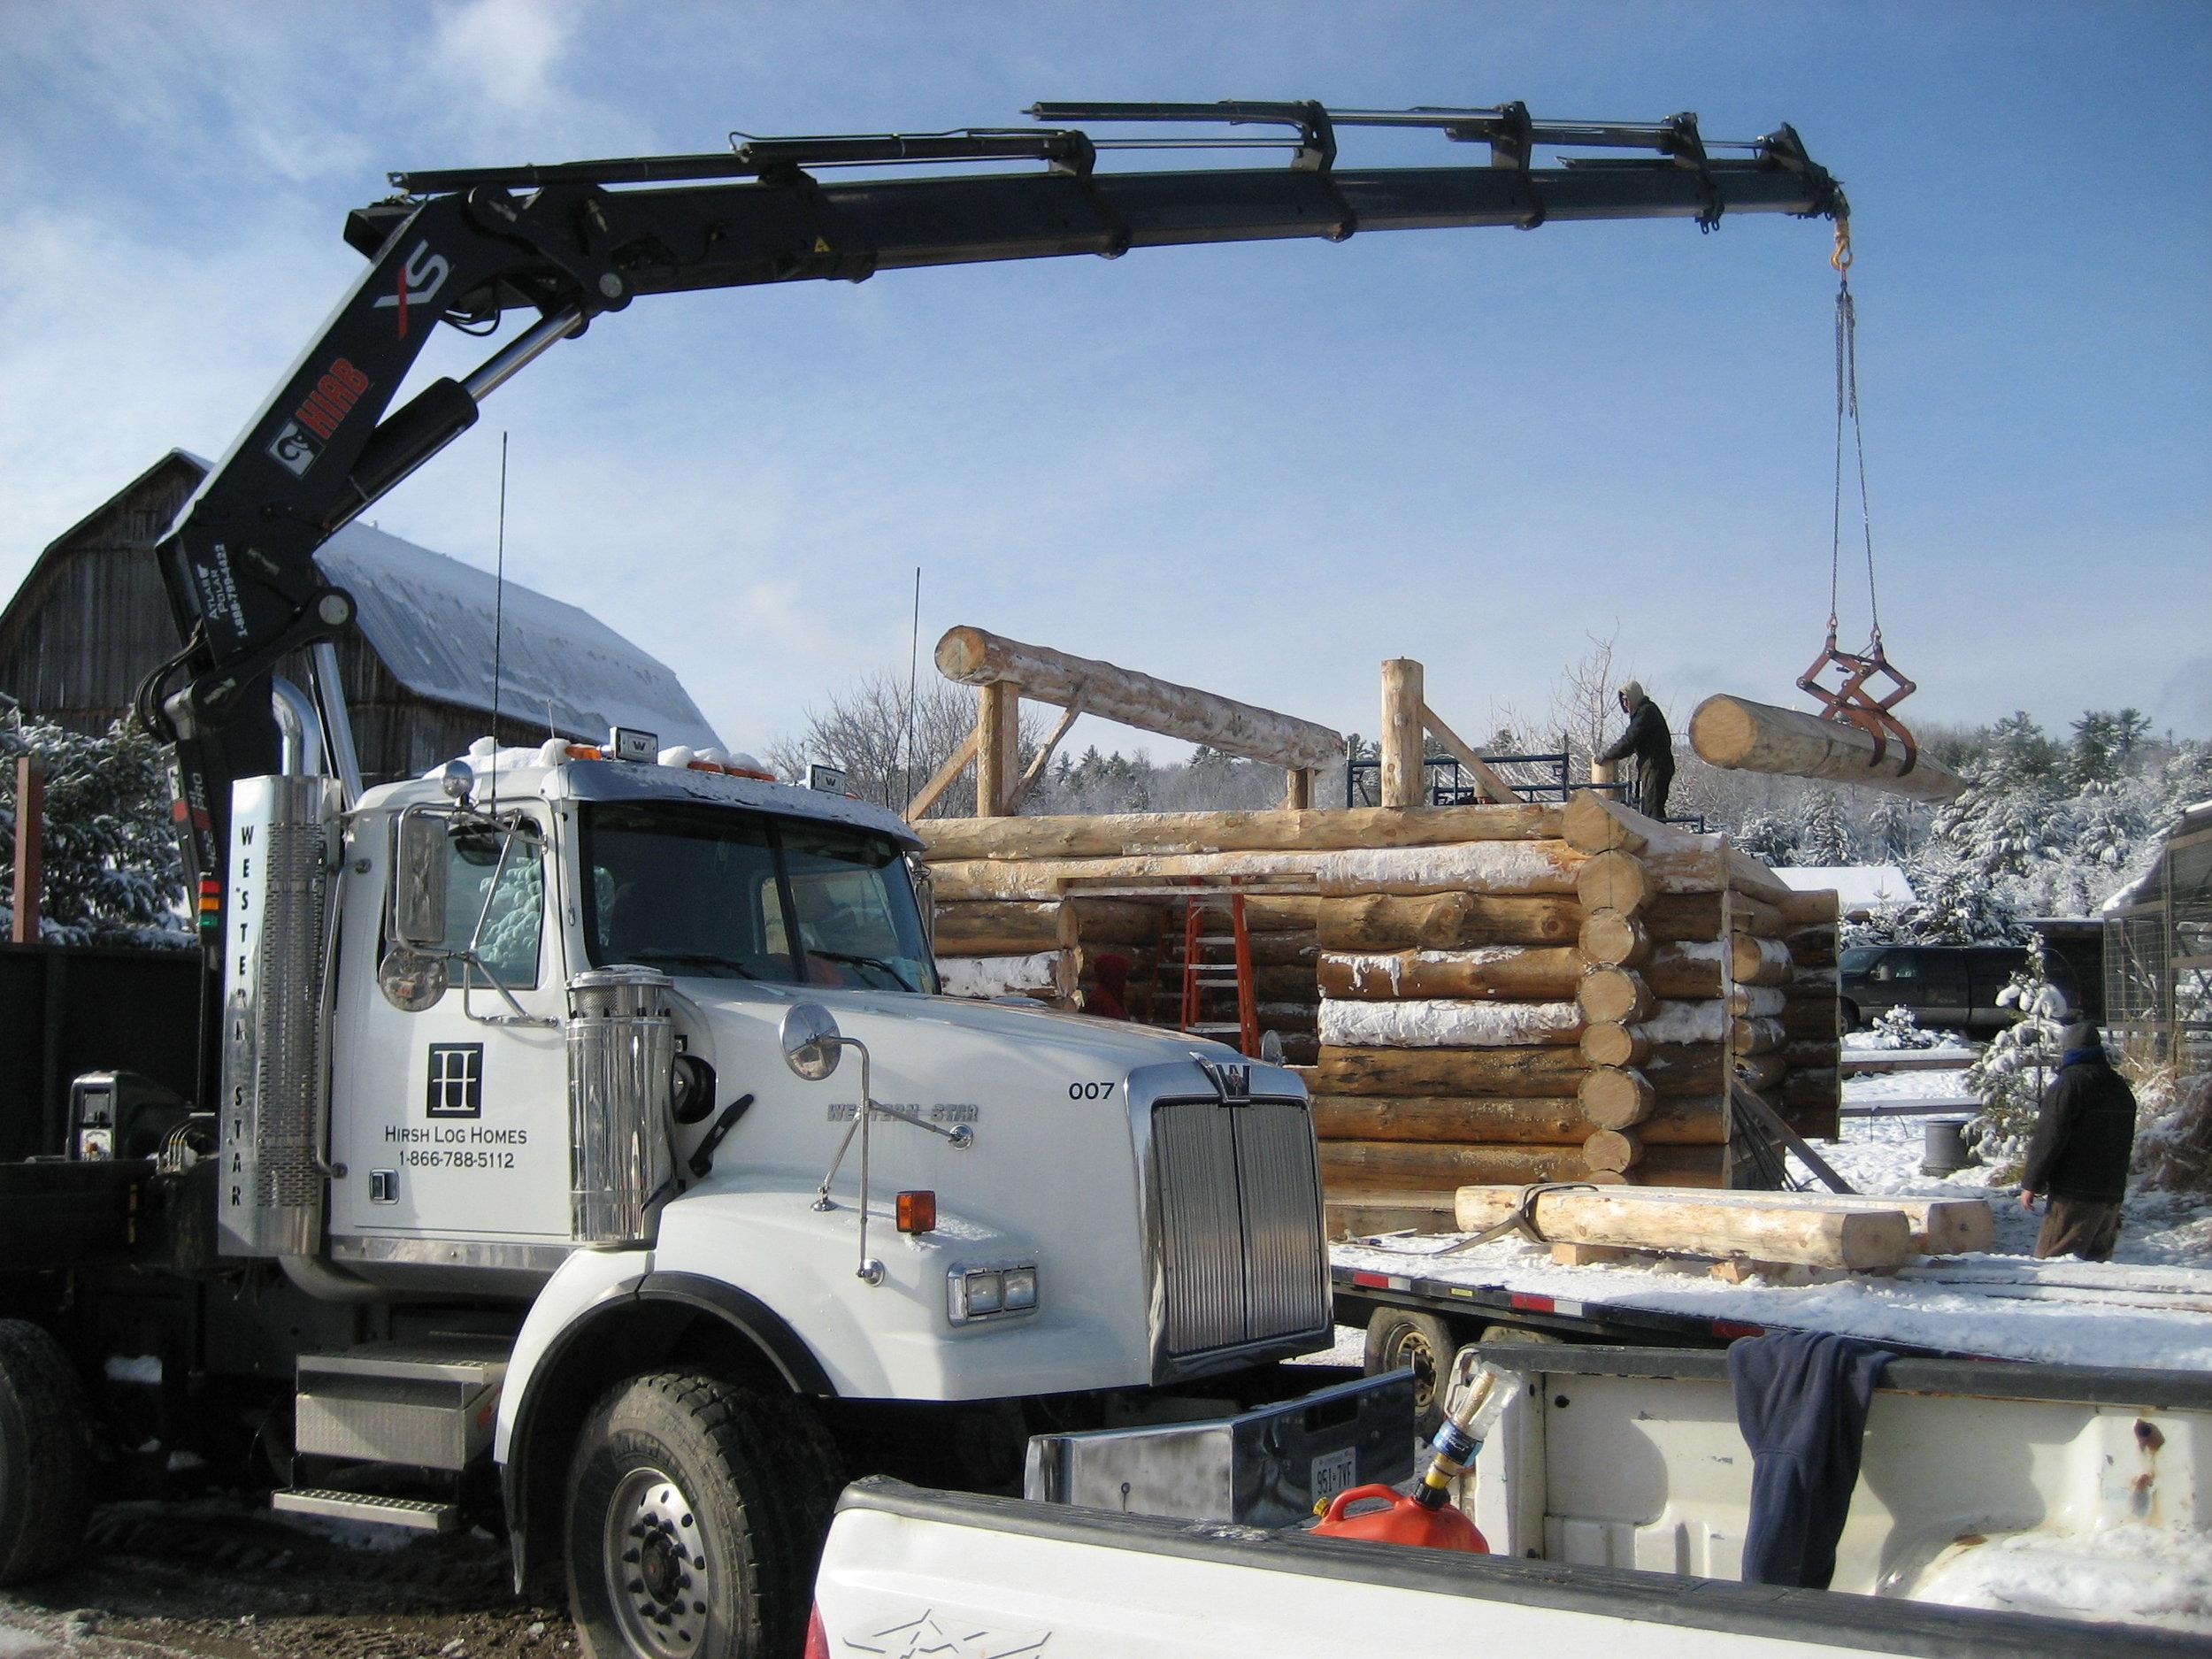 Hirsh Log Homes